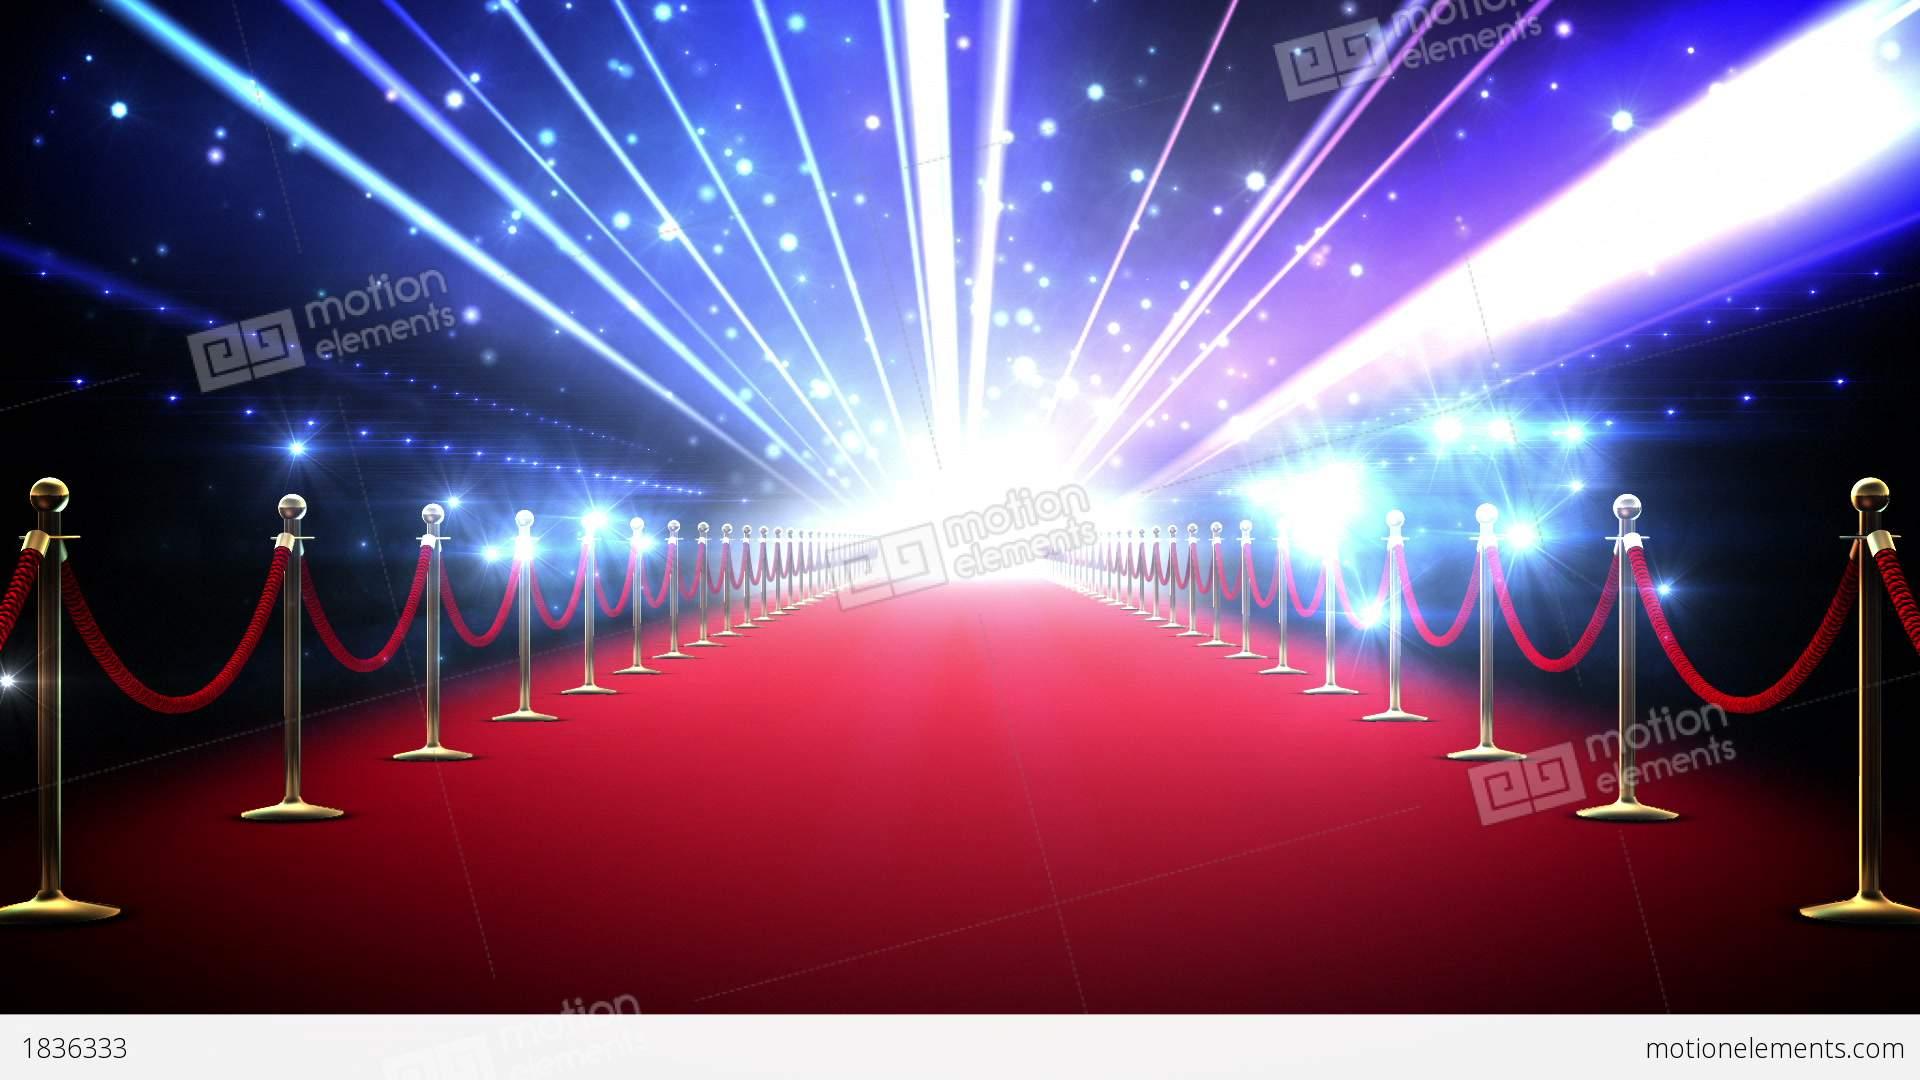 Red Carpet Event Backgrounds Avariiorg Home Design